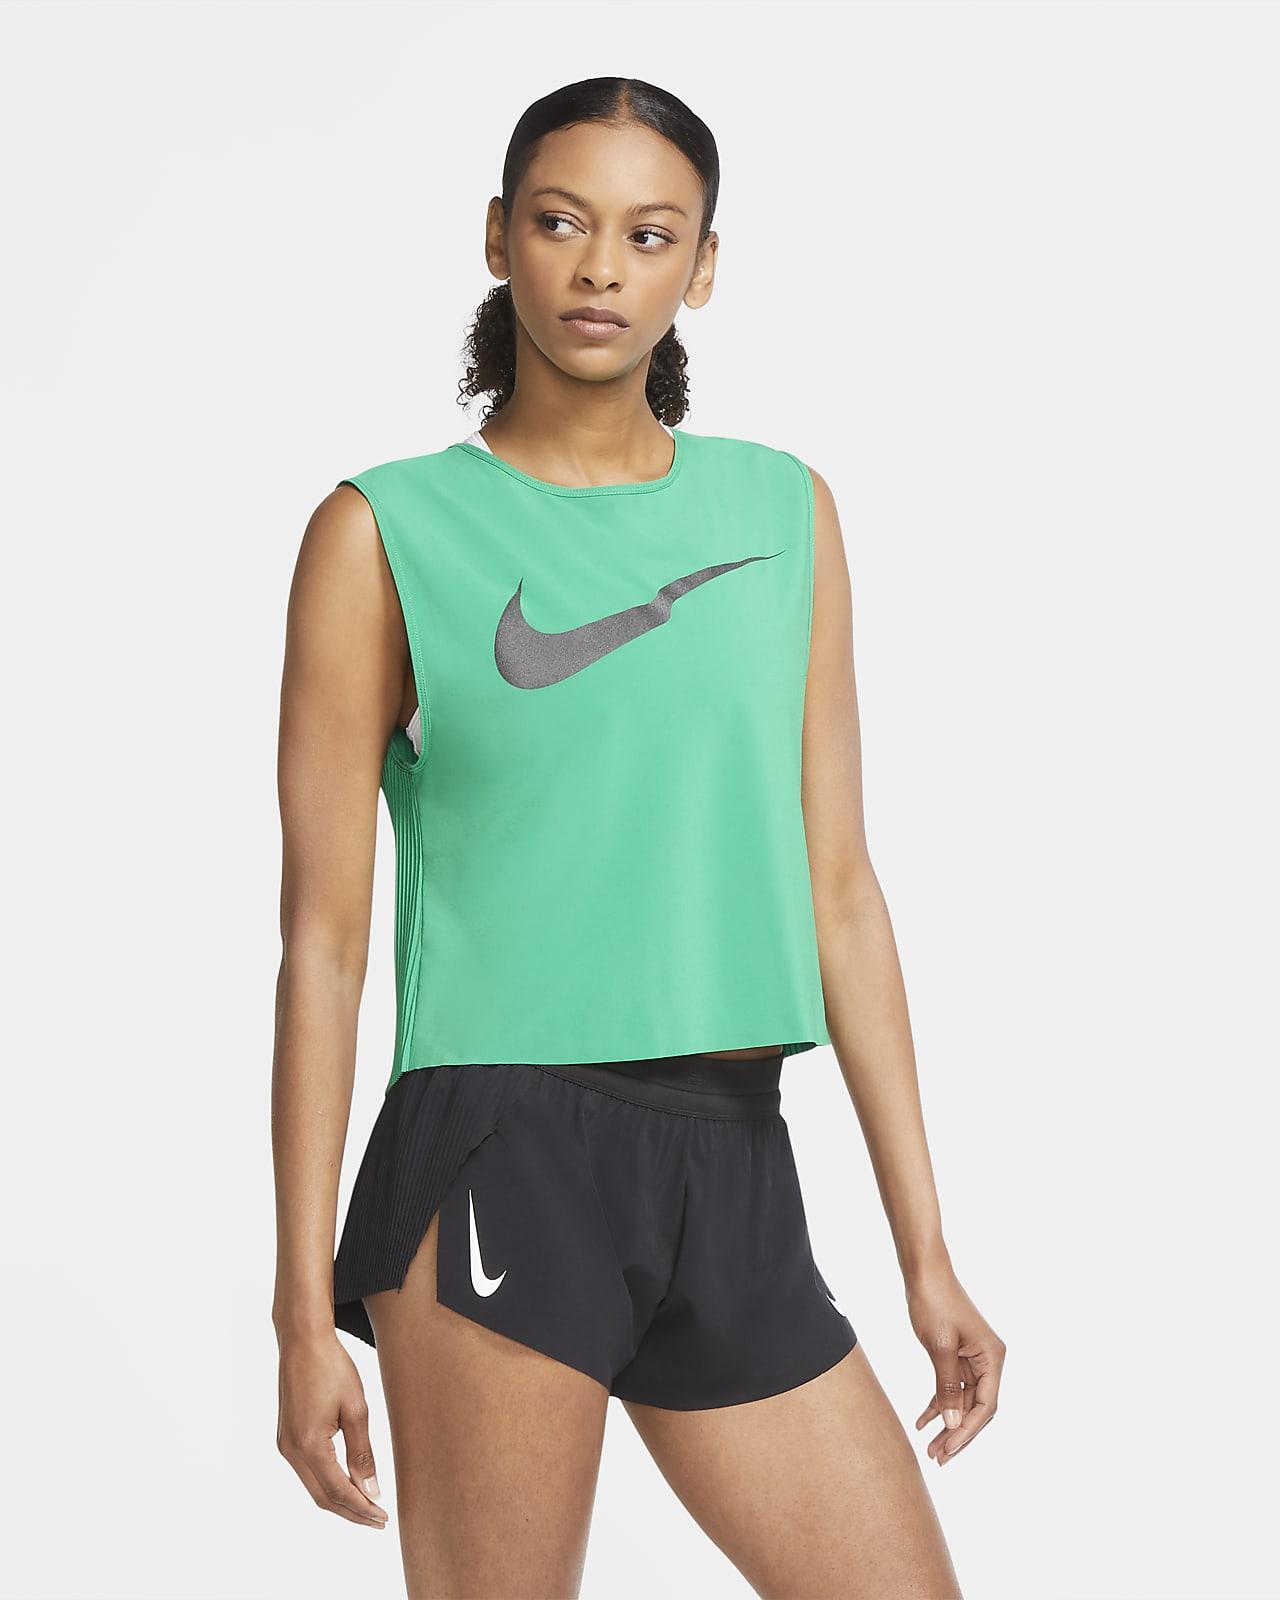 Nike Run Division Women's Pleated Running Tank